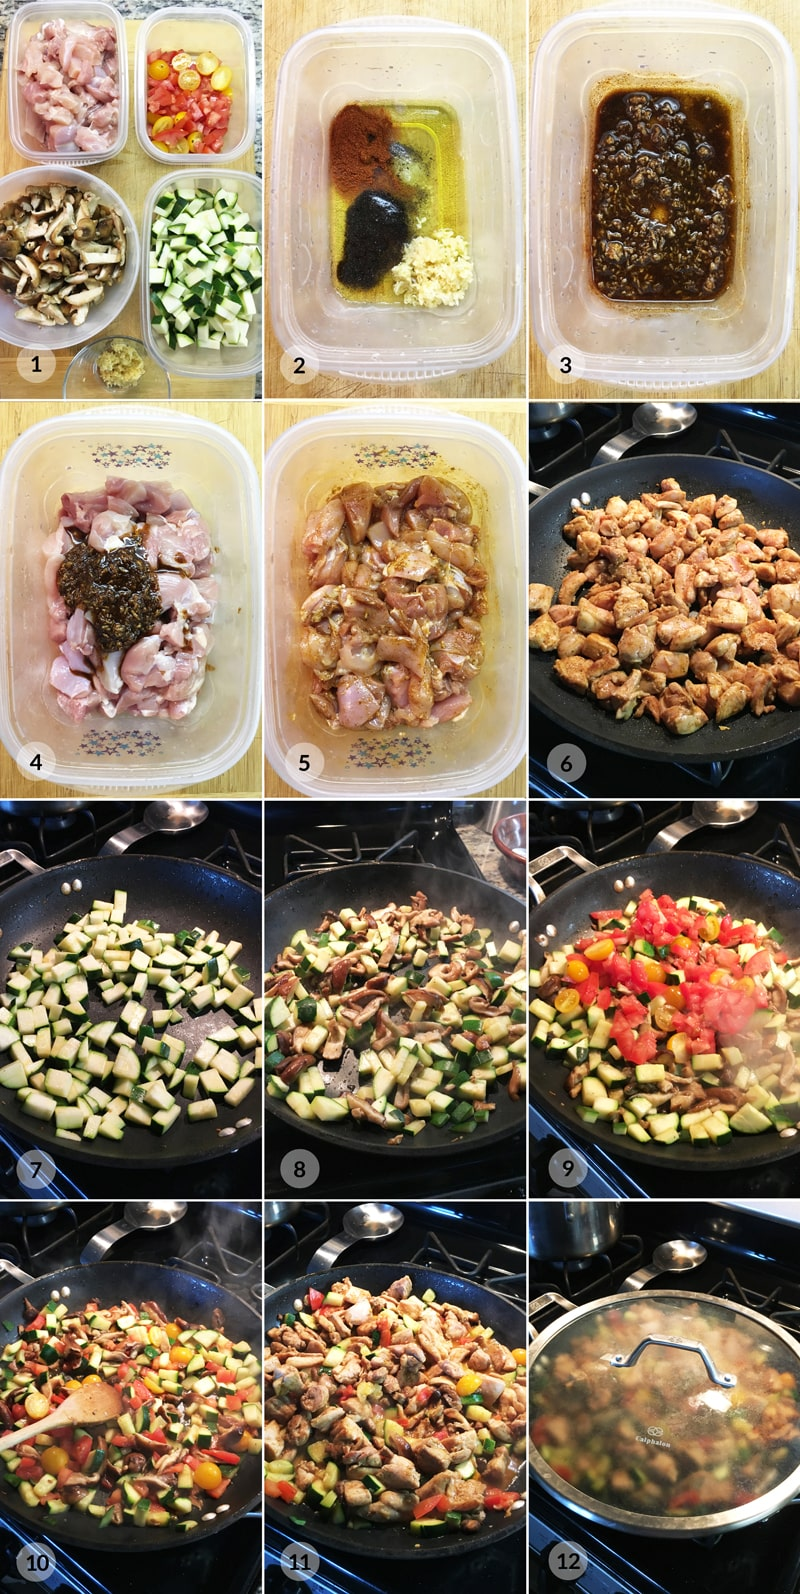 Zdravé kuřecí maso cuketa, houby, rajčata - recept Bajola